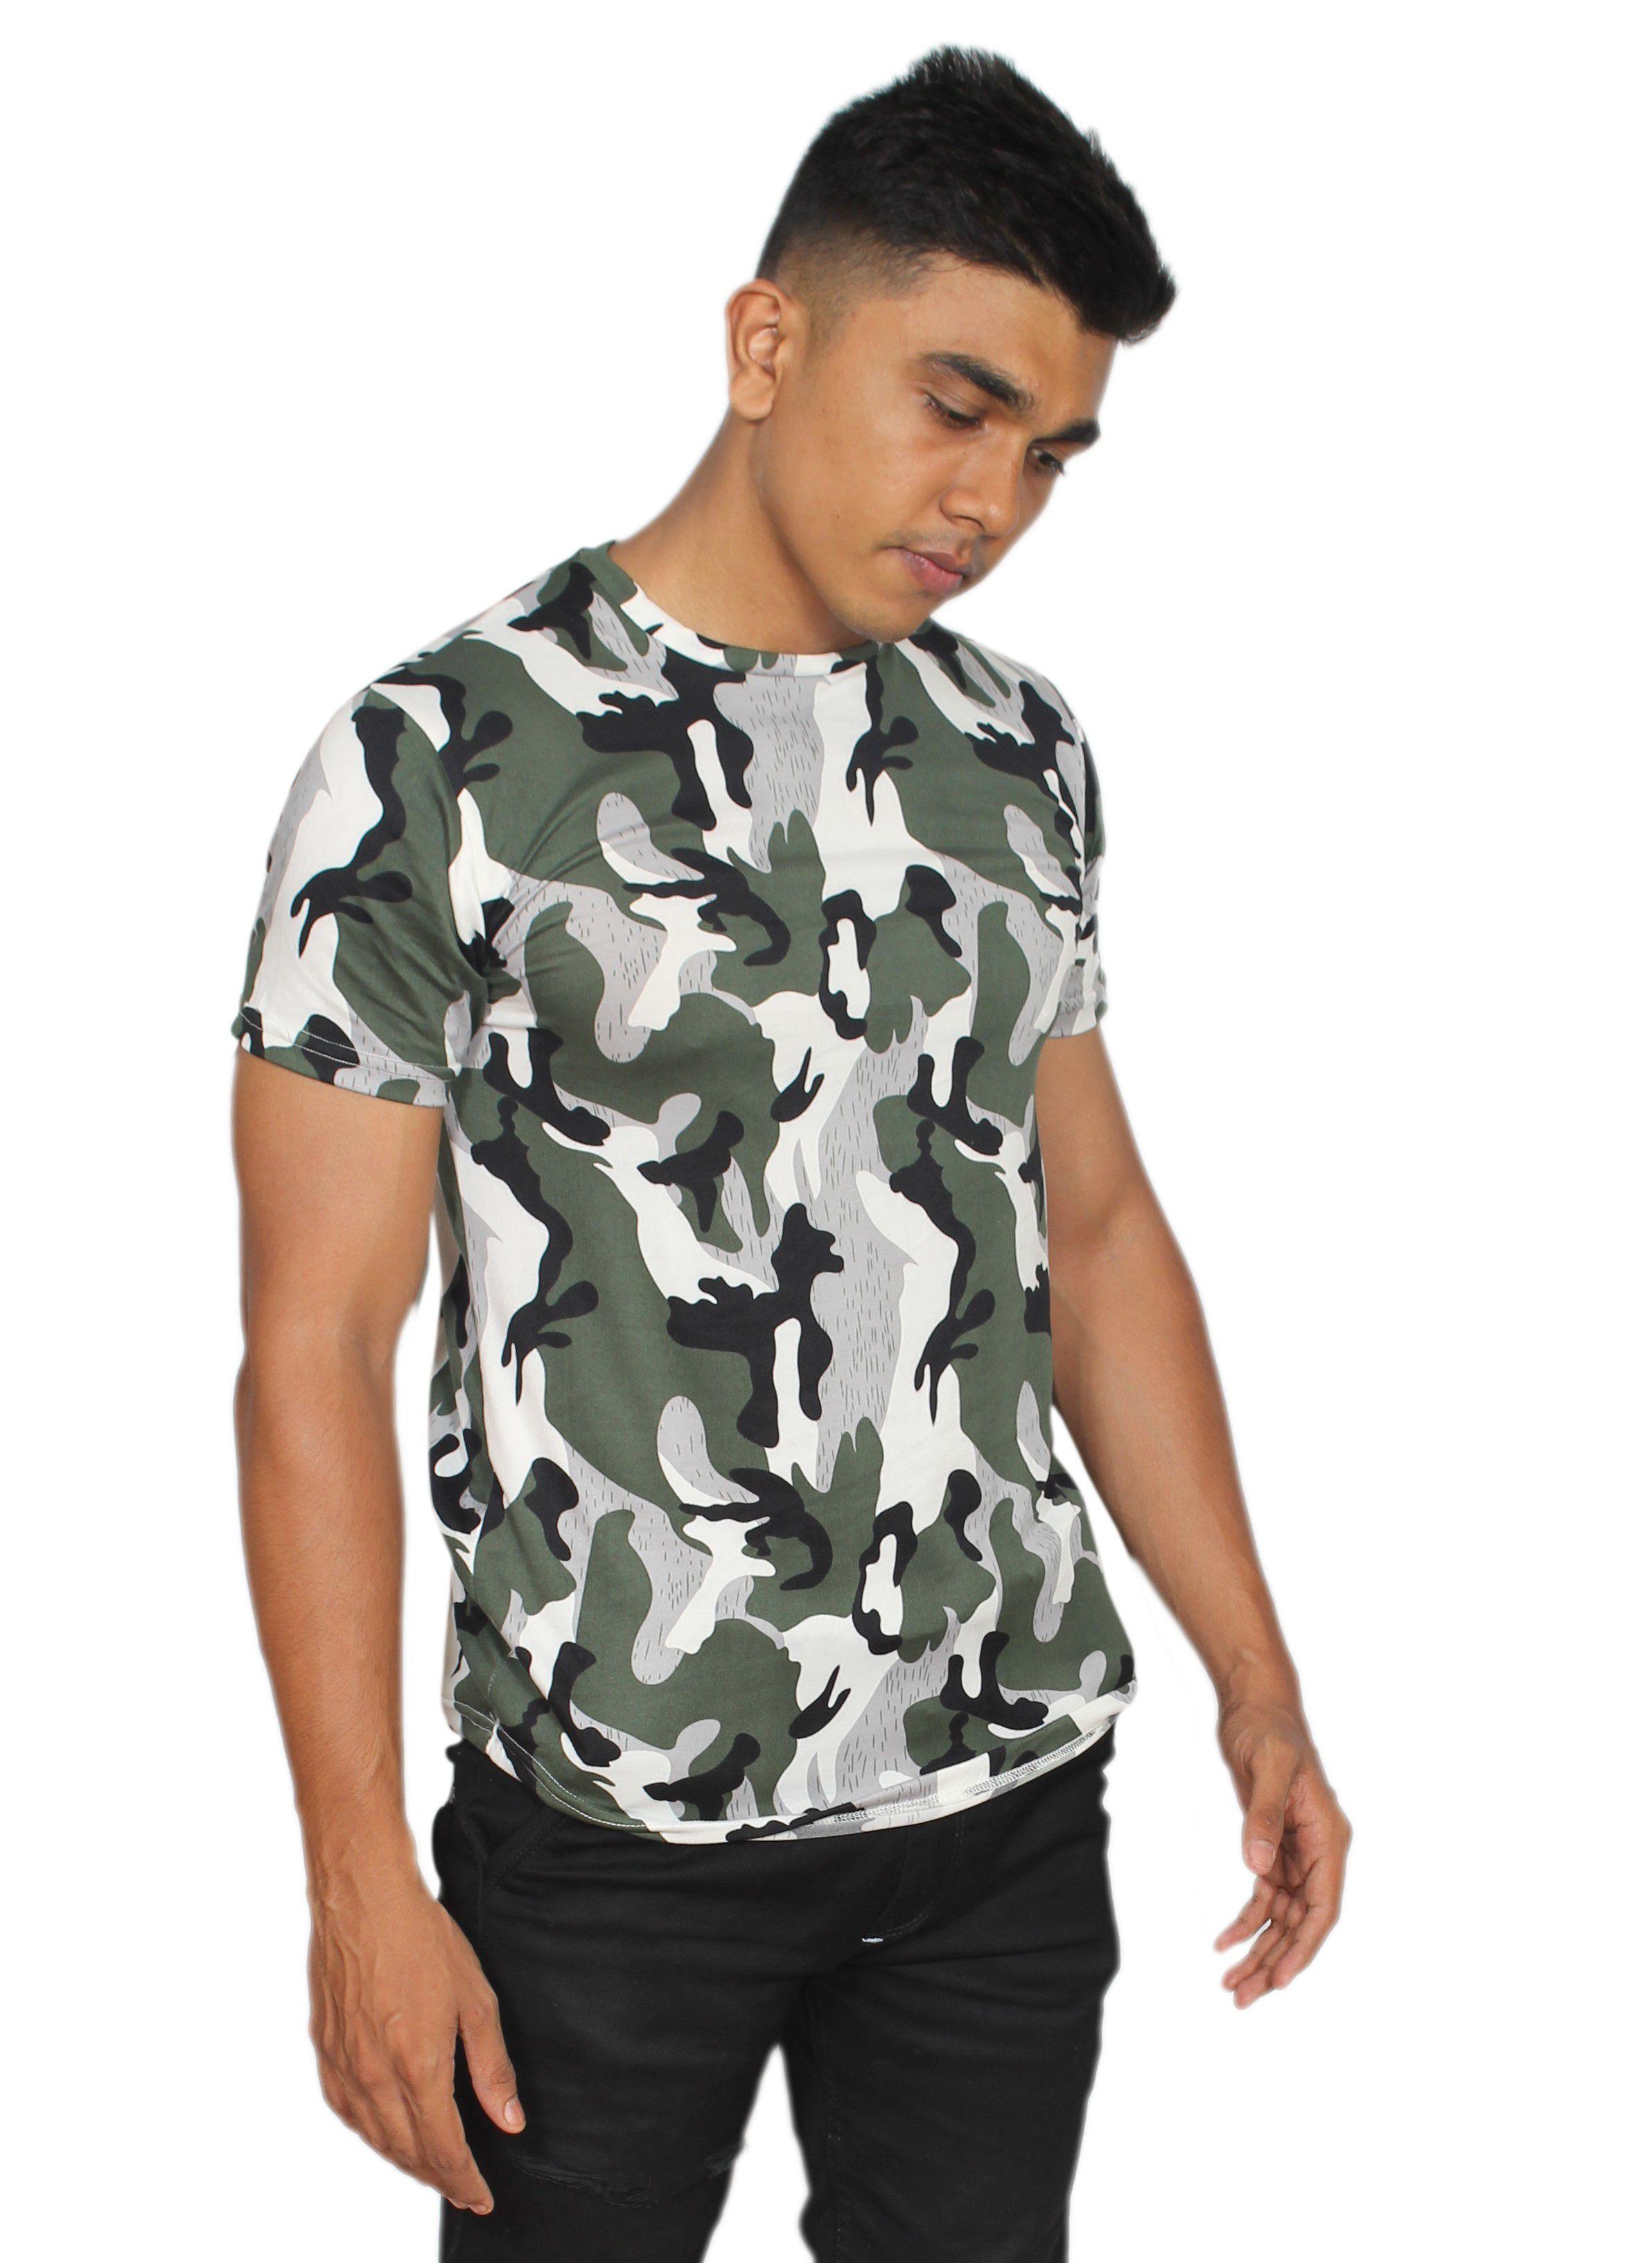 V SMIT Green Round T-Shirt Pack of 1